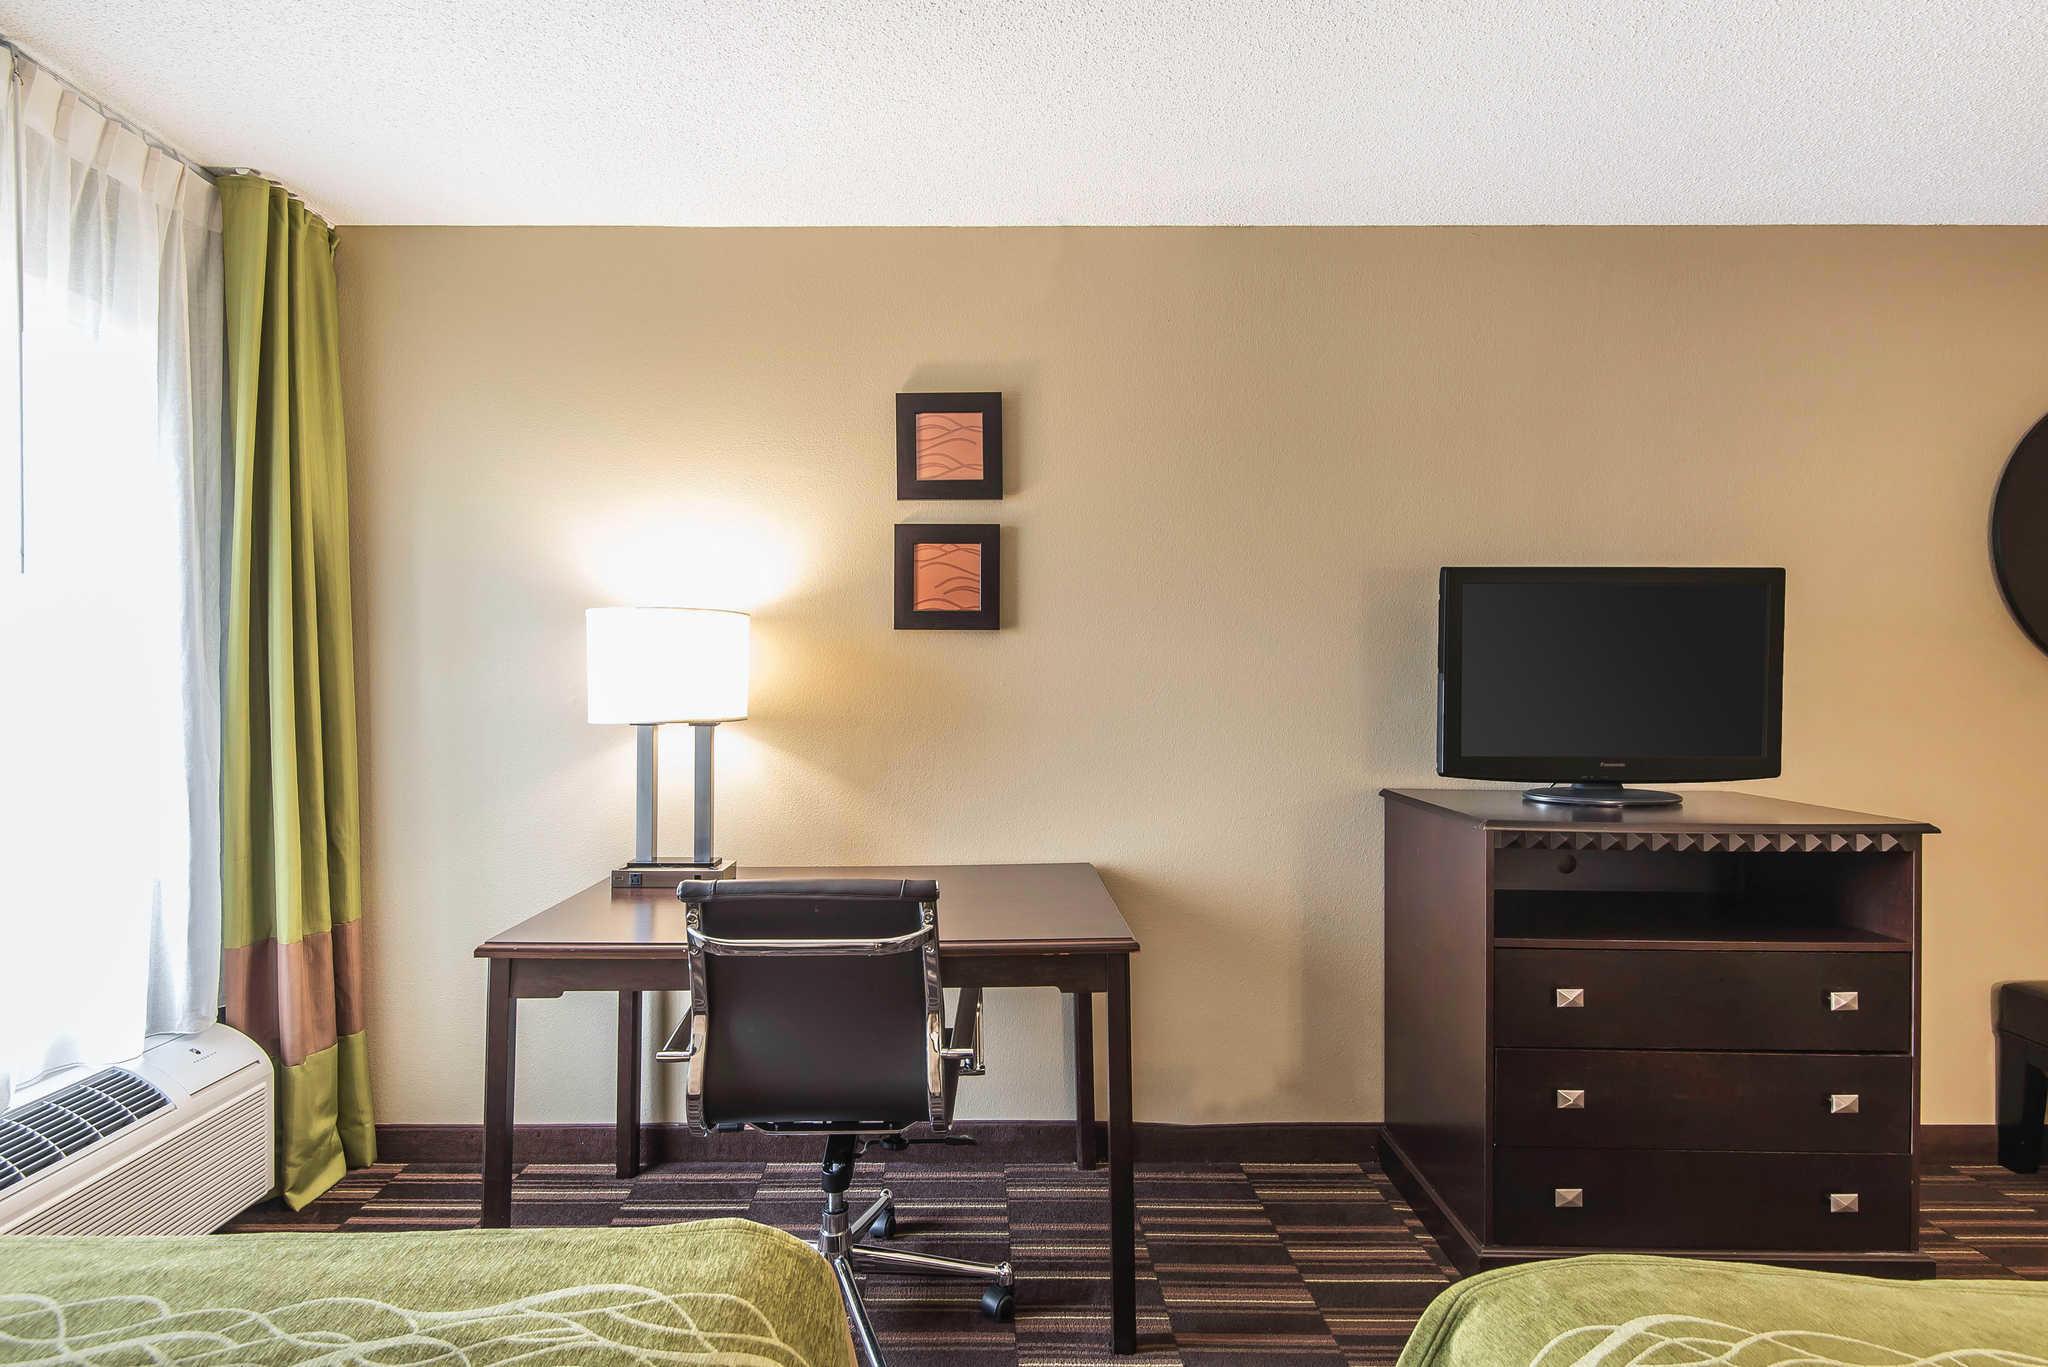 Comfort Inn & Suites Kansas City - Northeast image 18